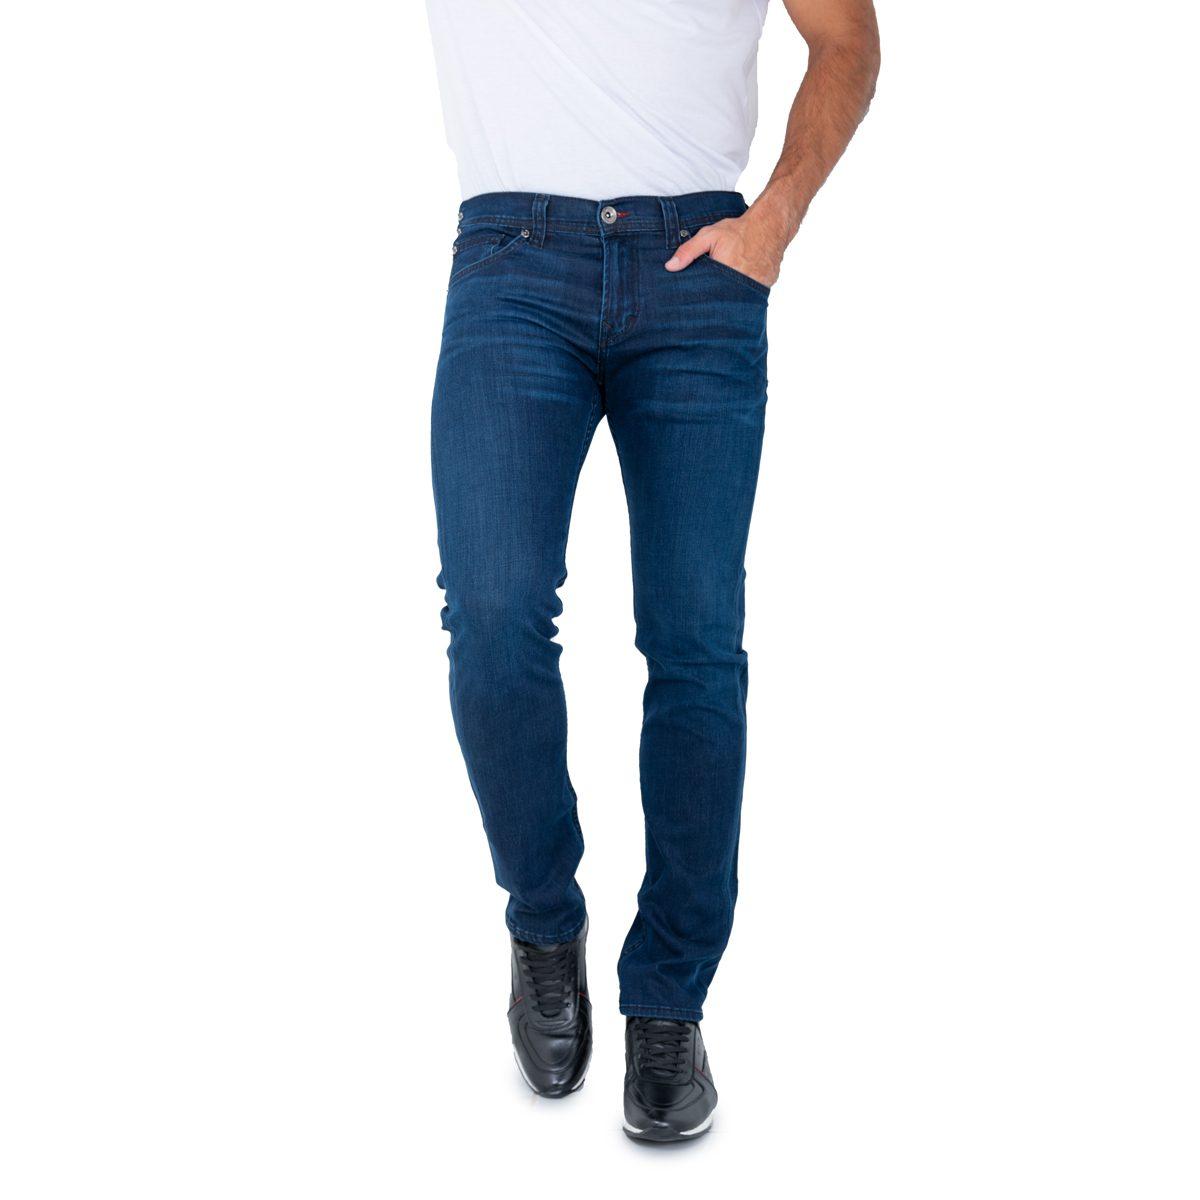 Pantalon Caballero Pavi Italy P00285